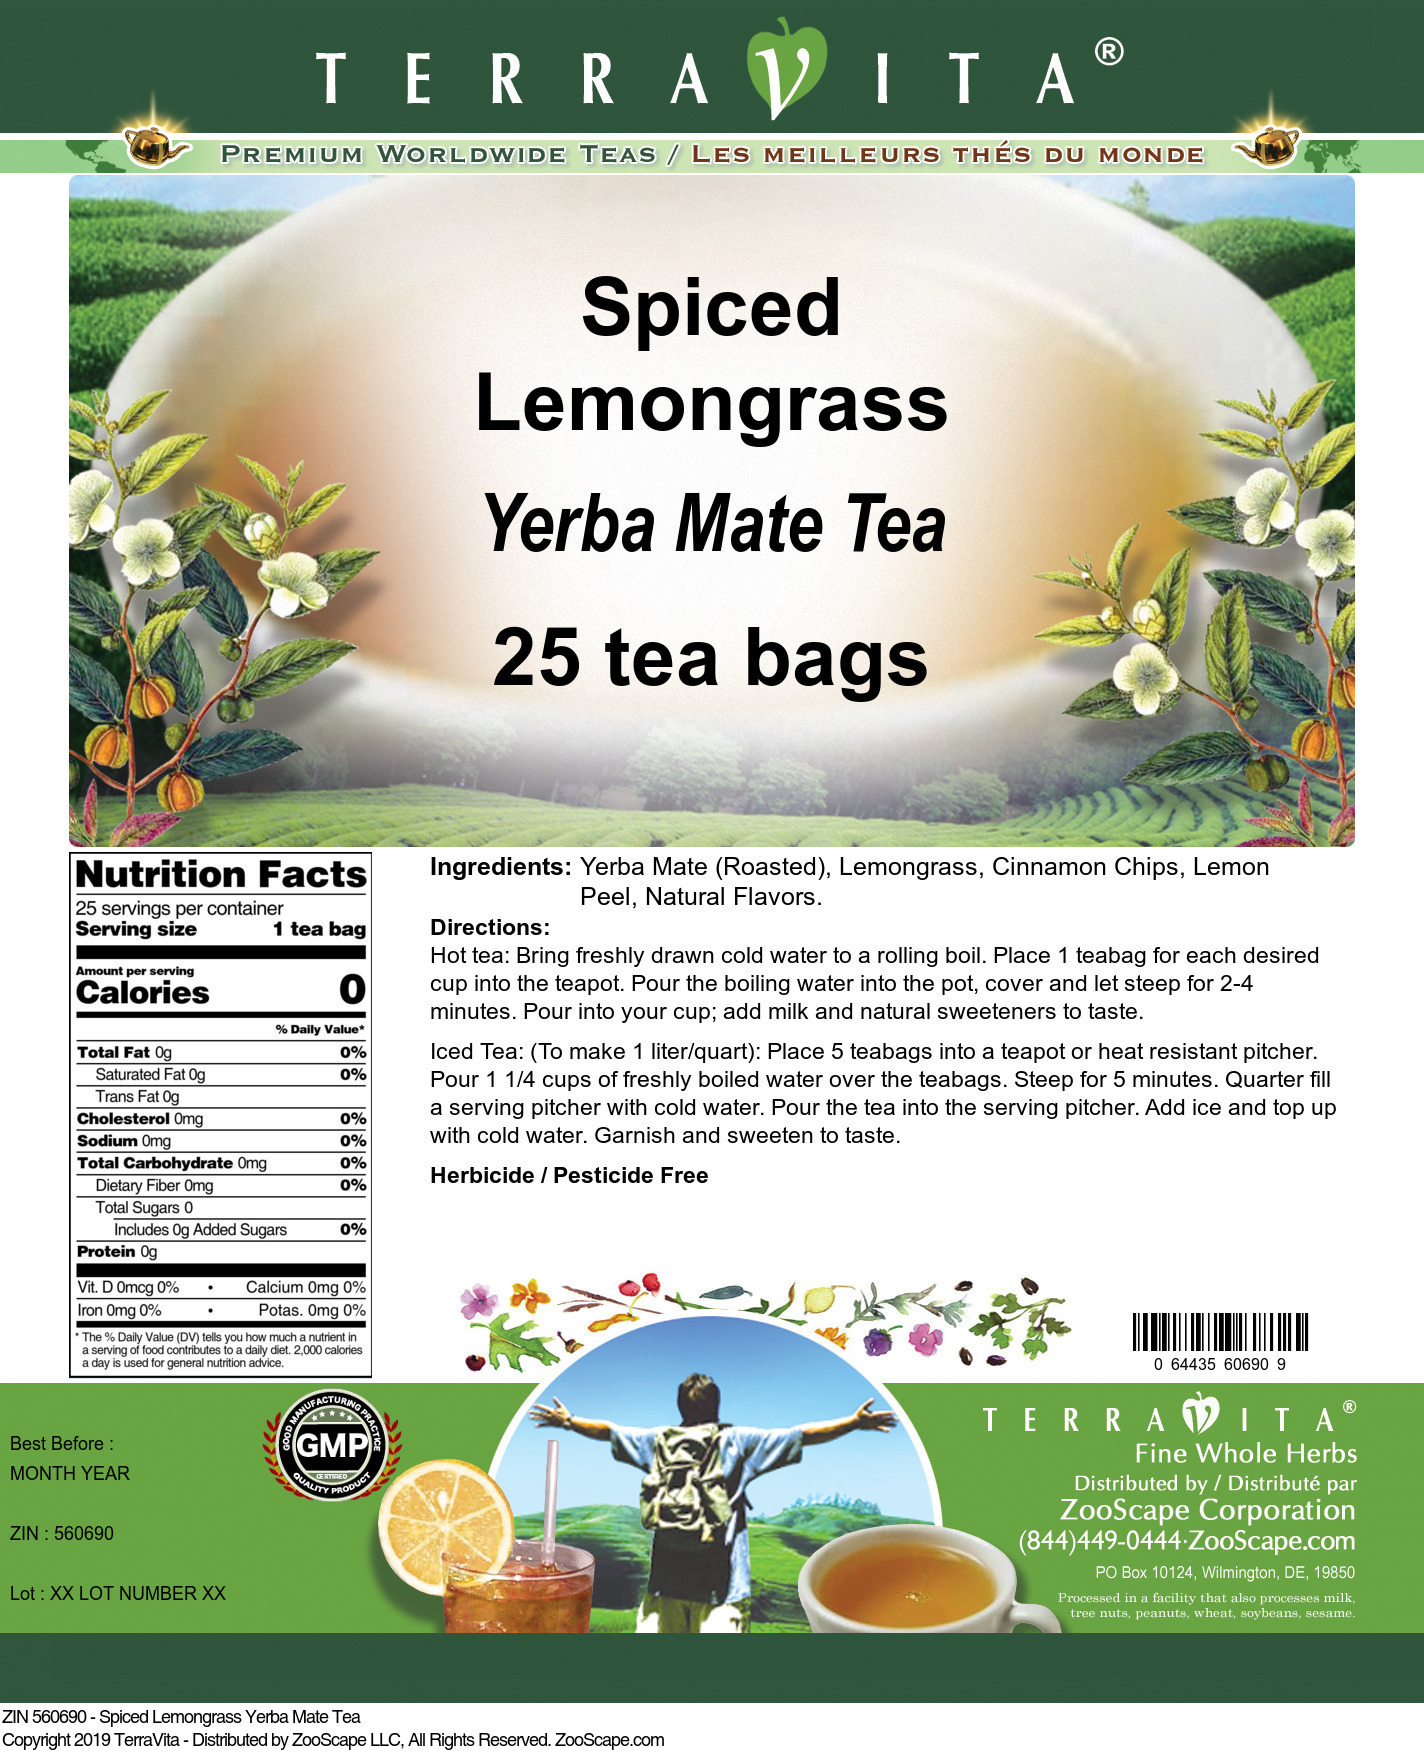 Spiced Lemongrass Yerba Mate Tea